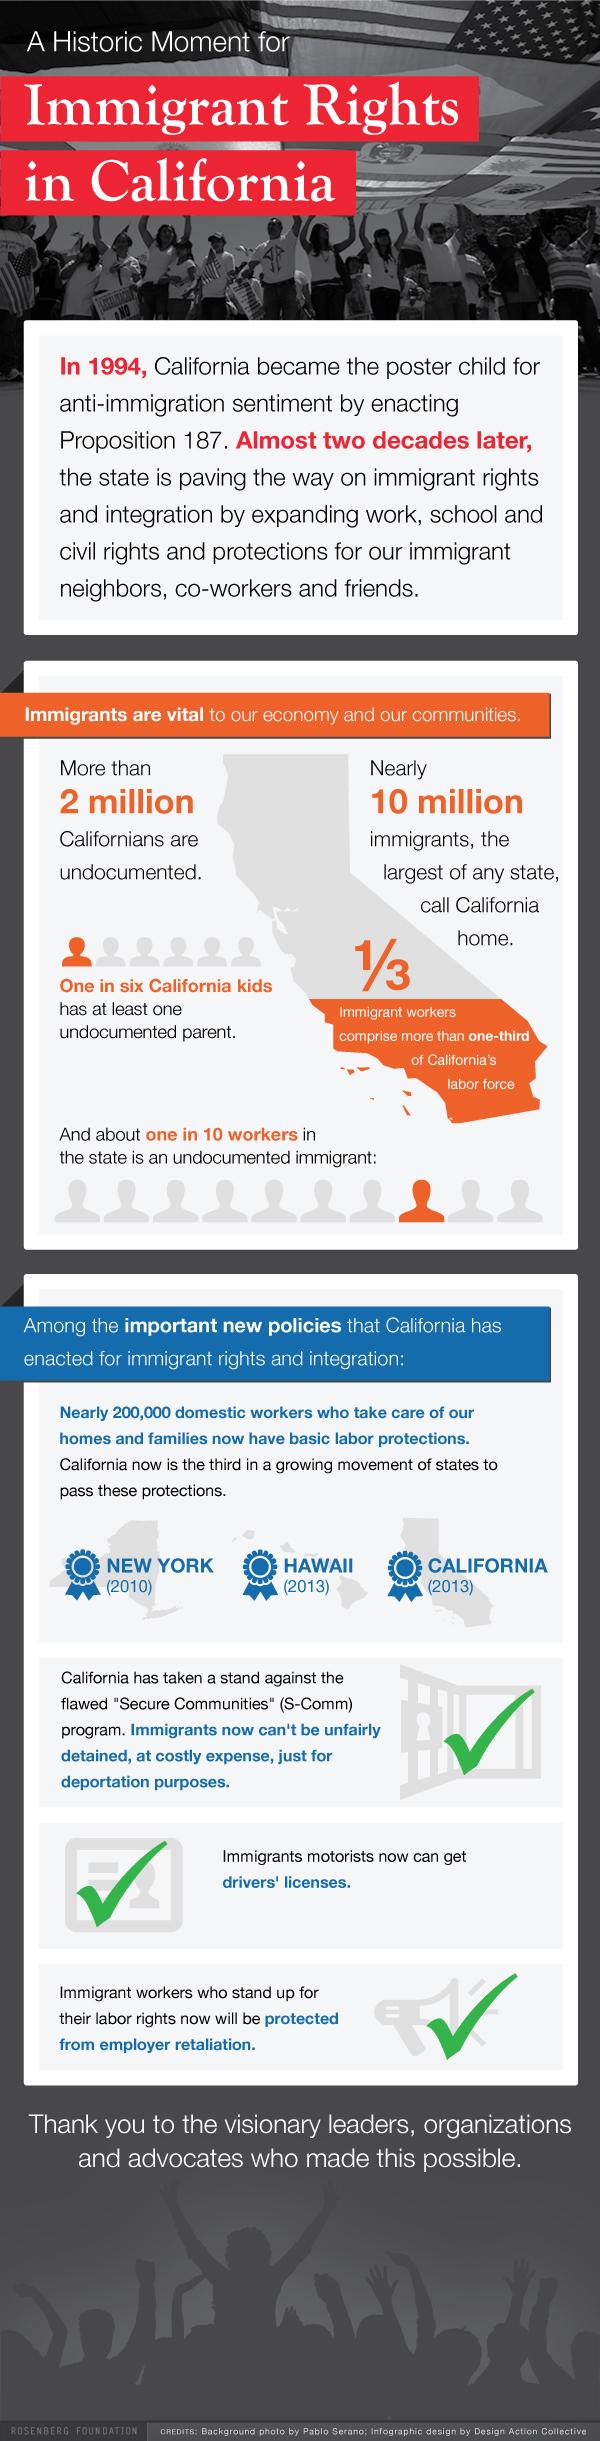 ImmigrantRightsInfographic.jpg